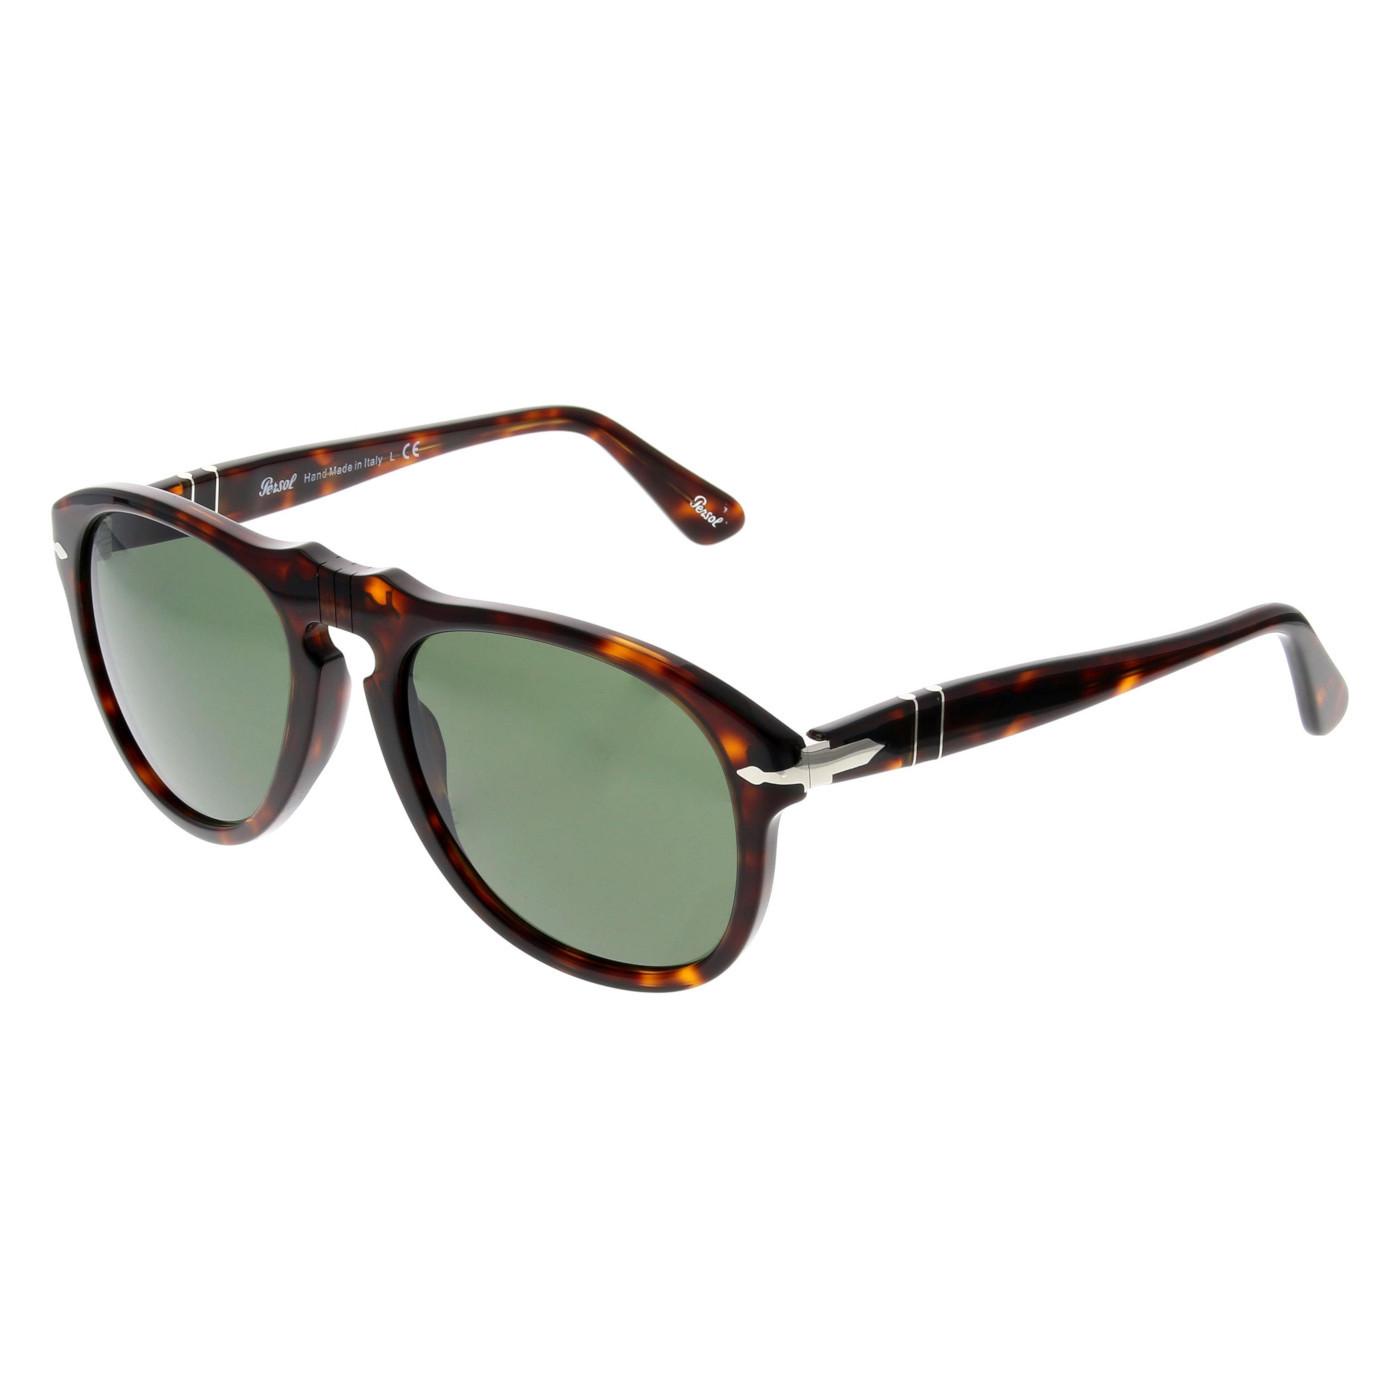 70c7f79ad18d7 Persol Havana Sunglasses PO0649 24 31 - Sunglasses